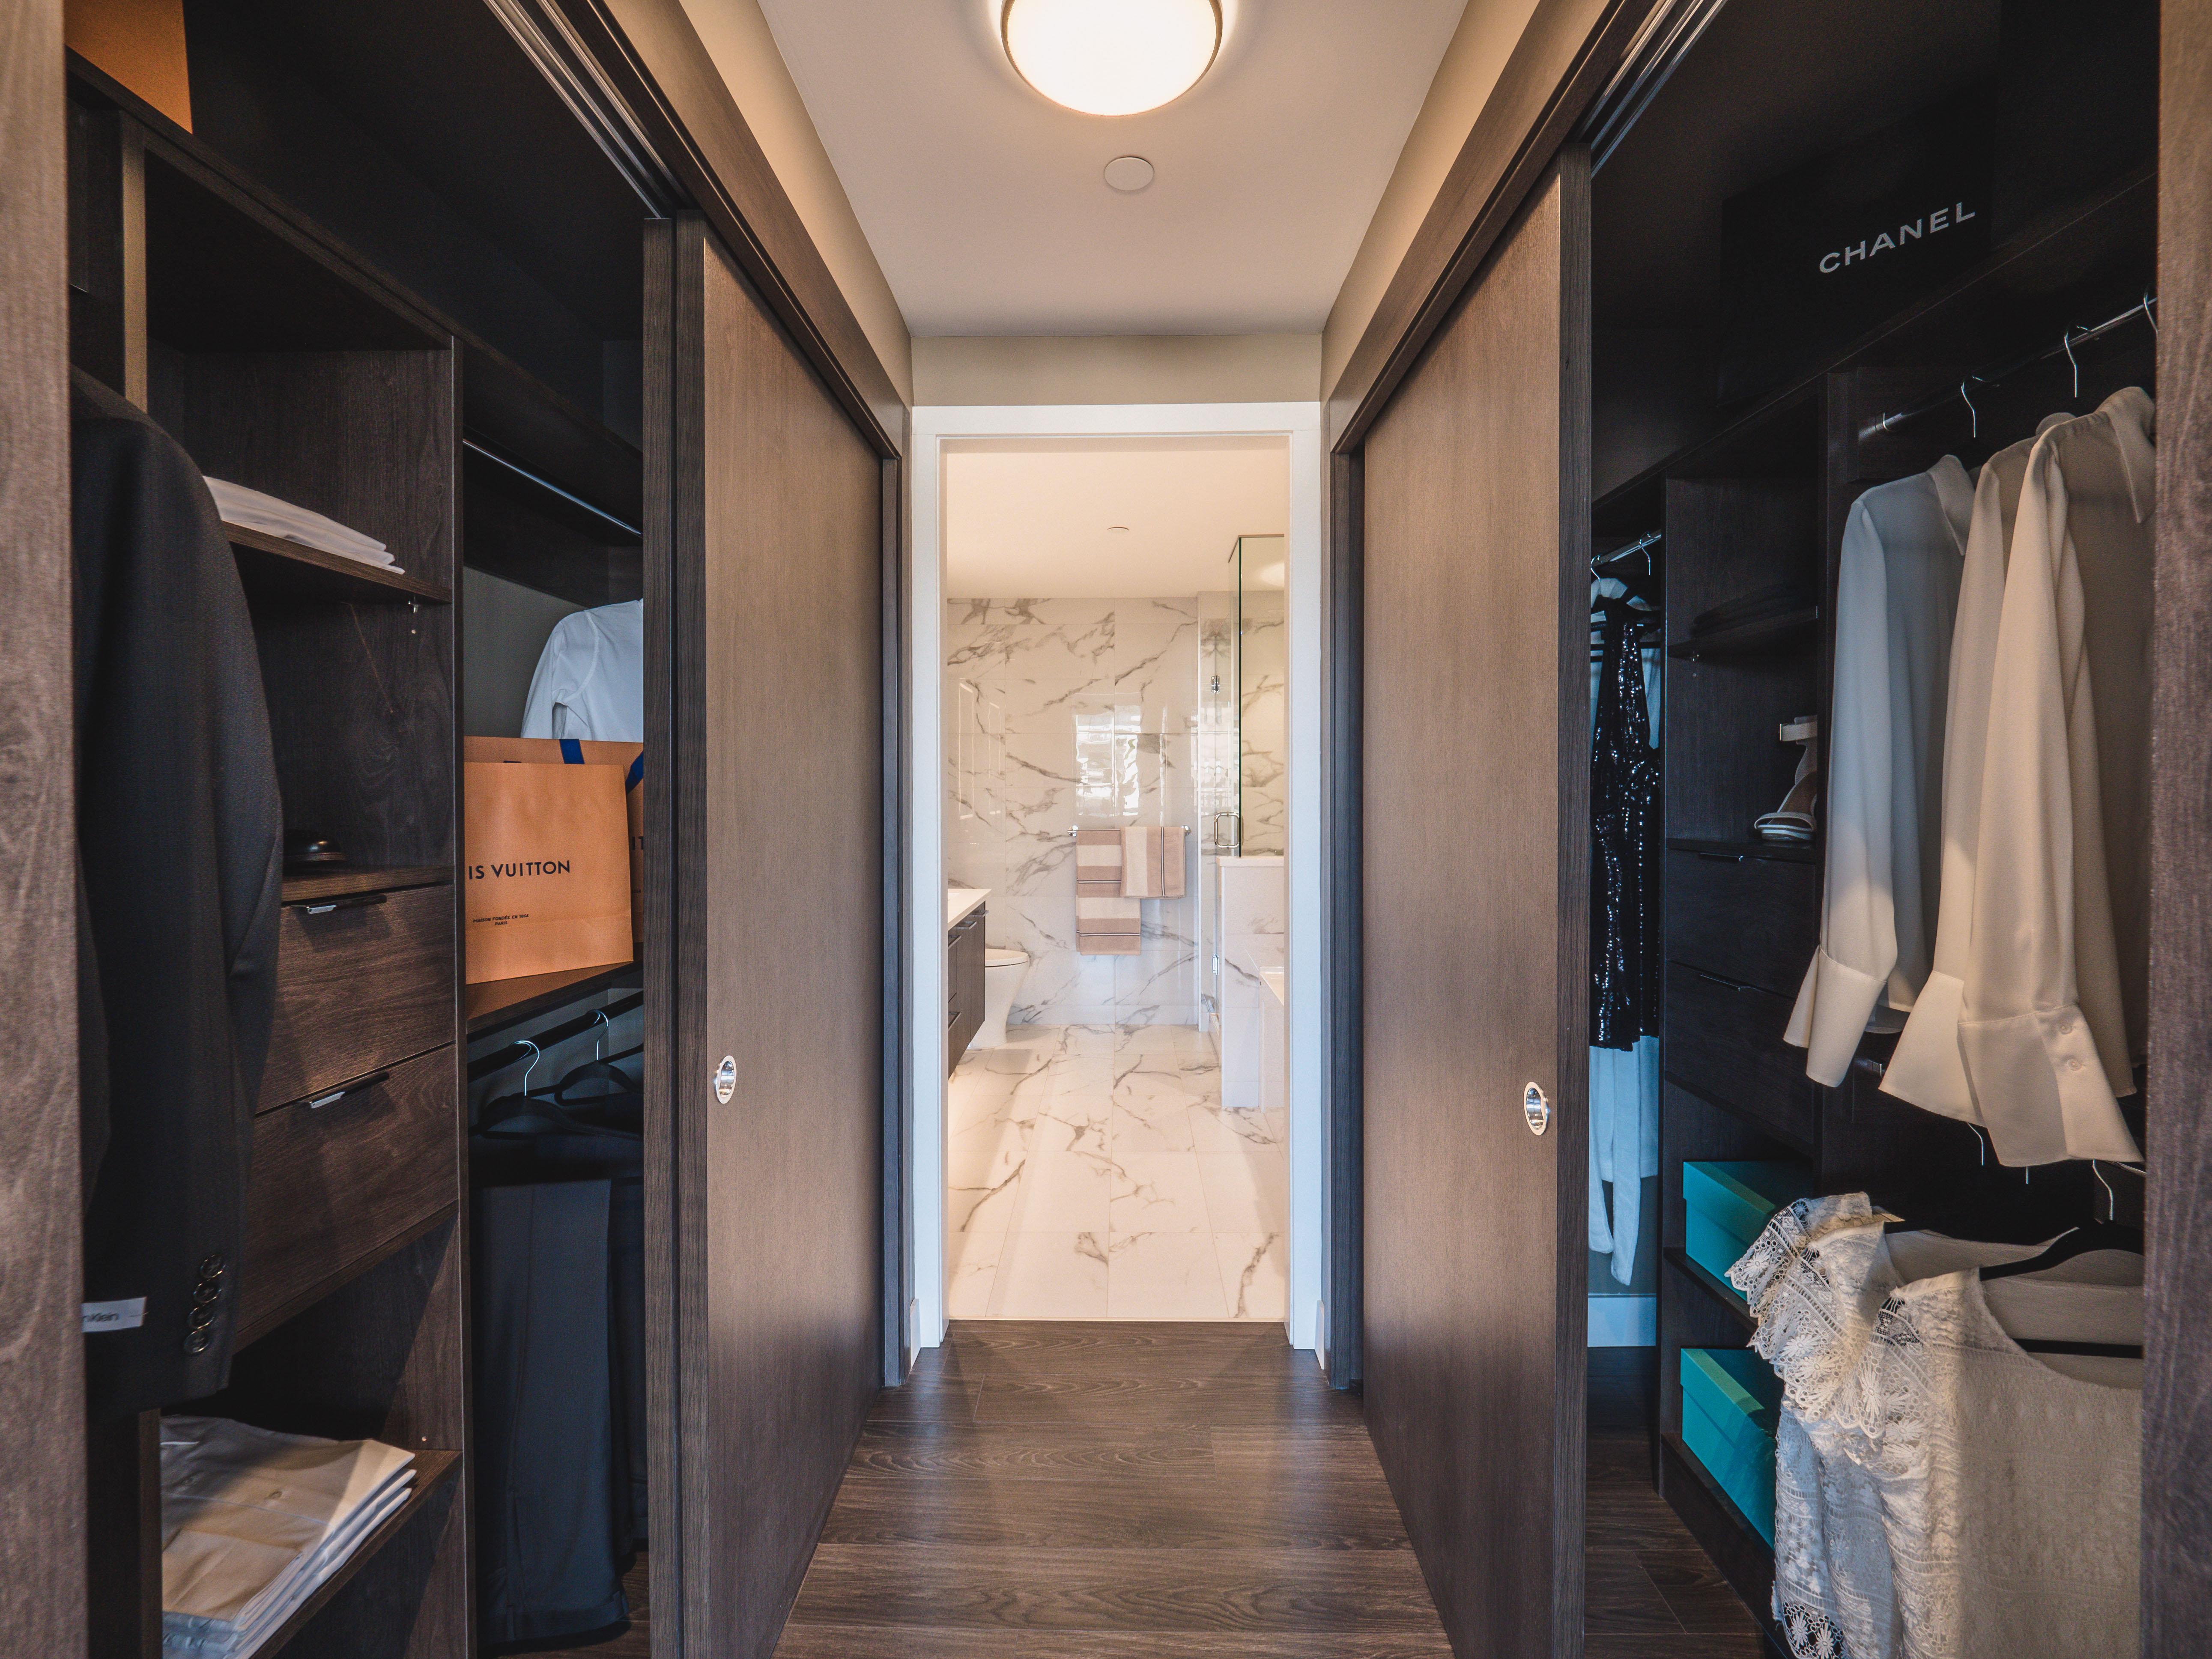 Walk-in closet - 6398 Silver Ave, Burnaby, BC V0V 0V0, Canada!